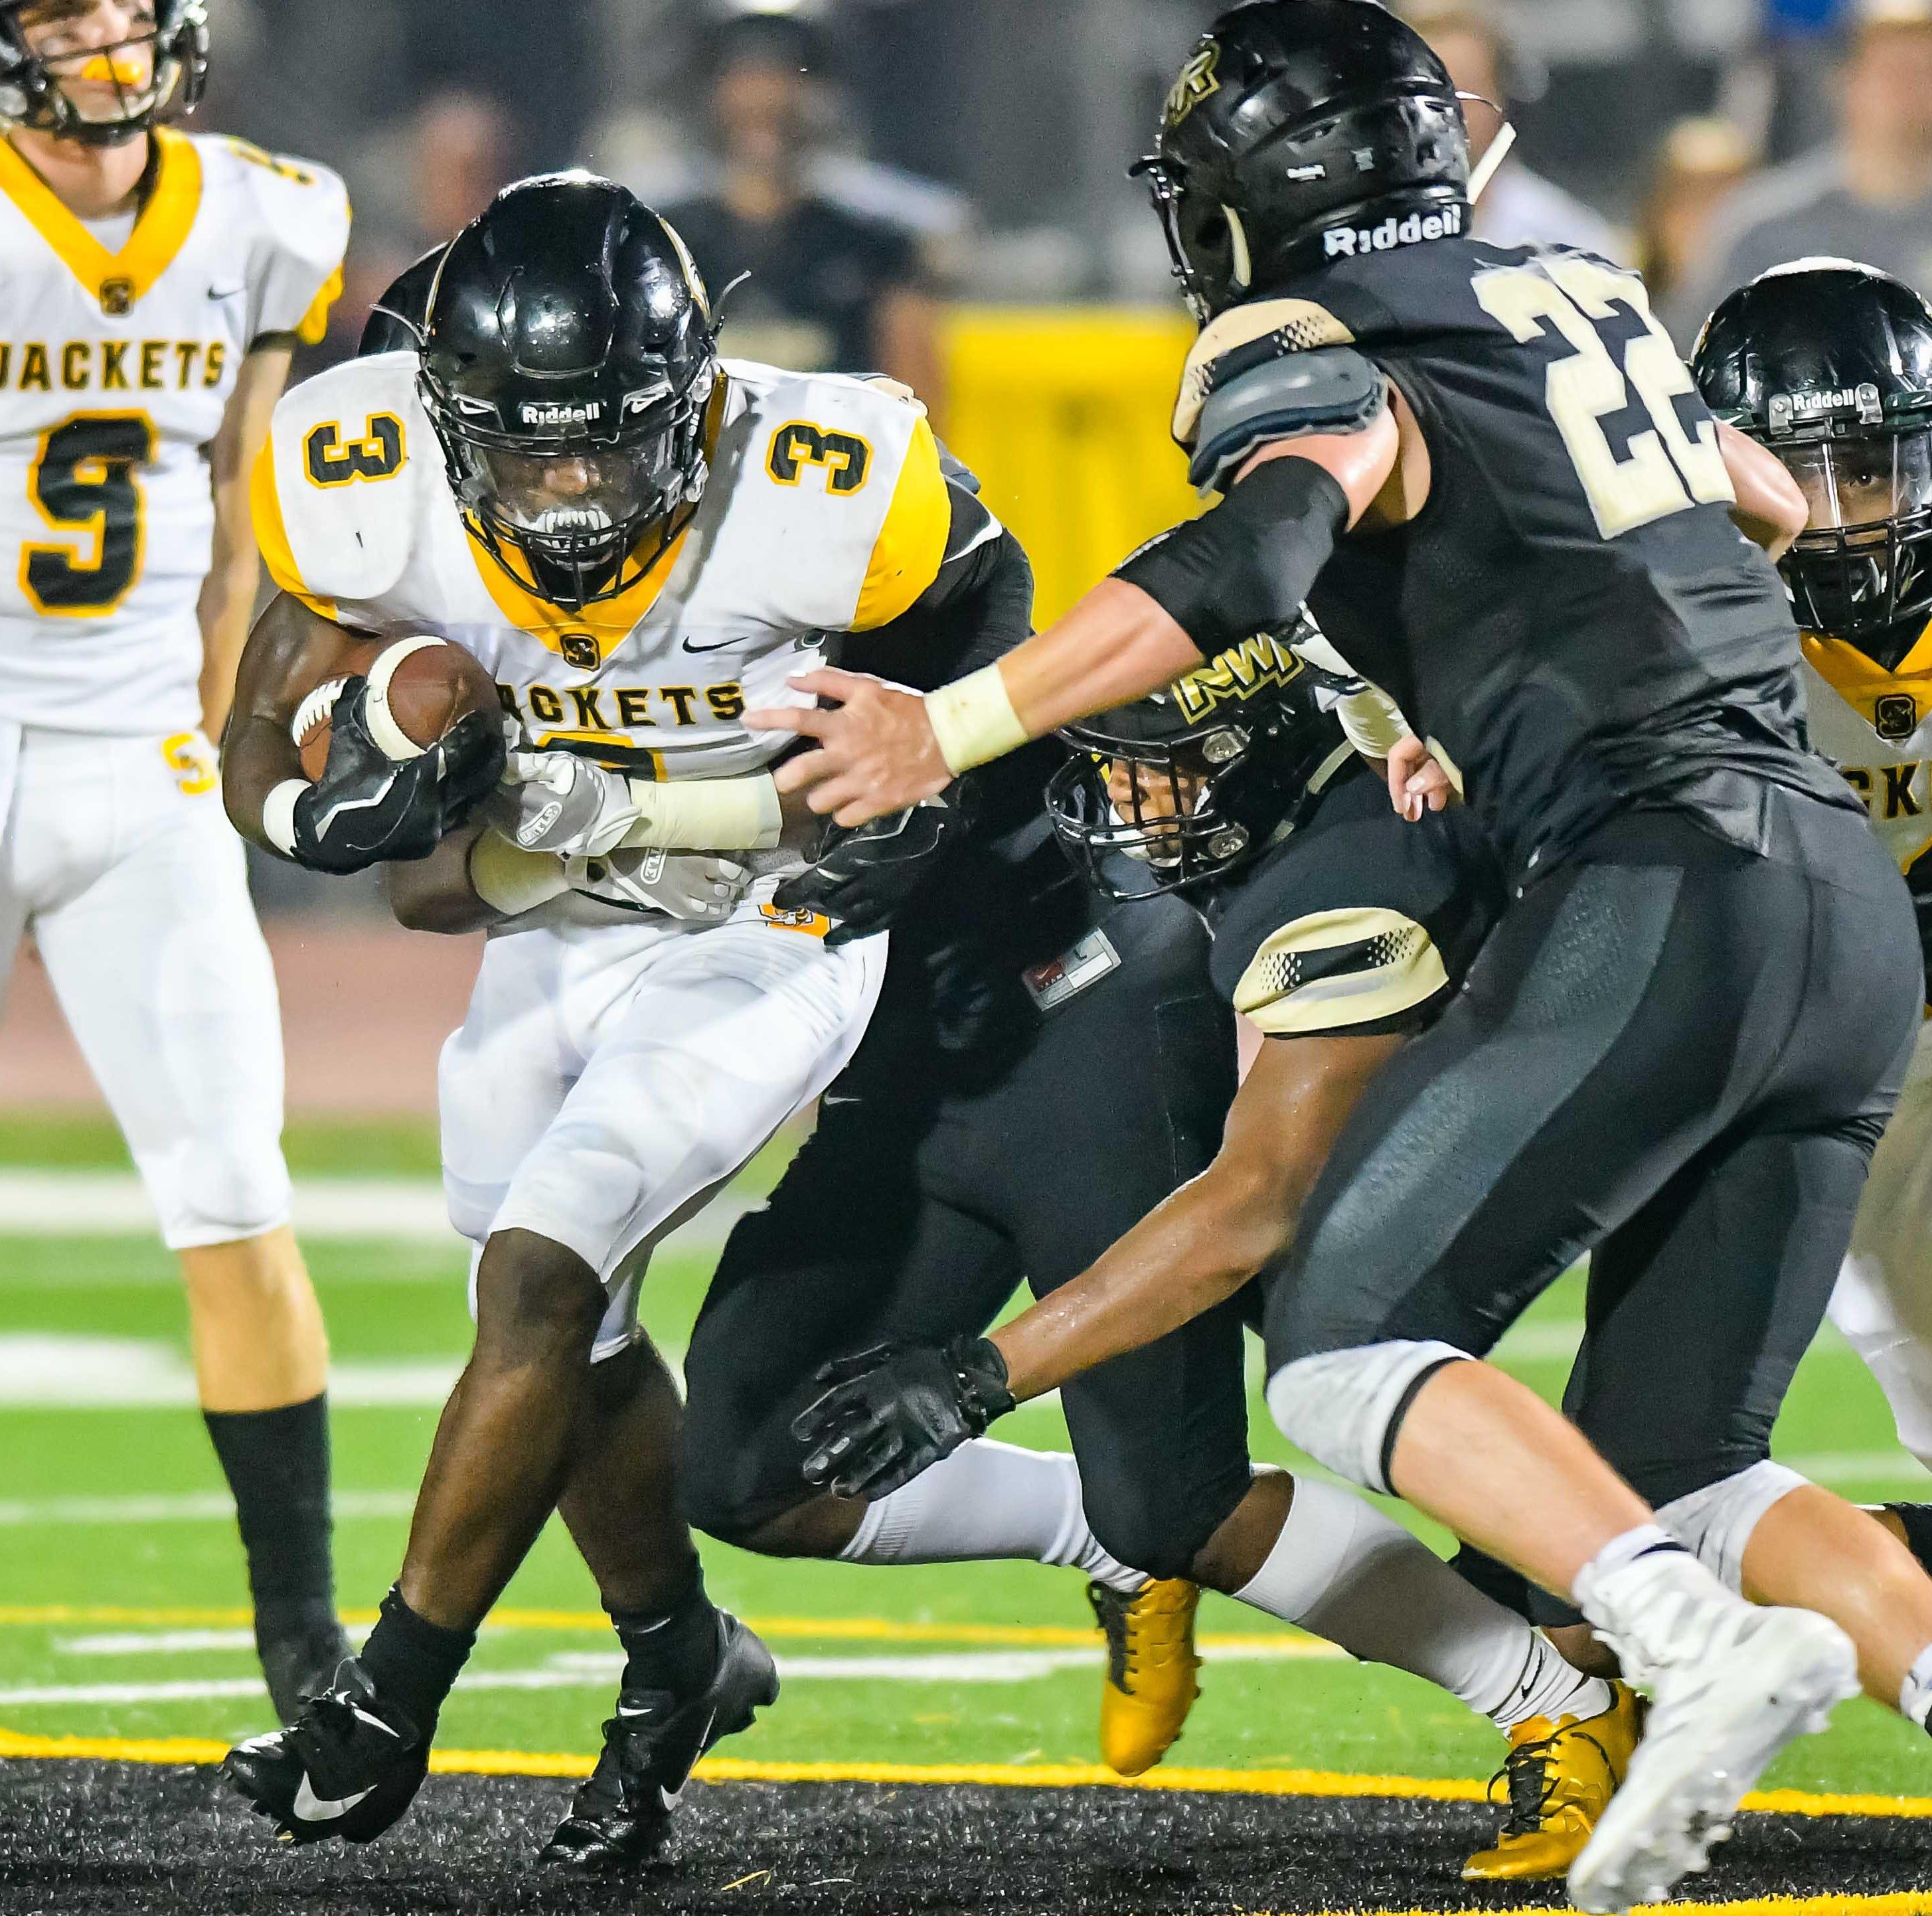 #MSPreps: Mississippi high school football scores, Week 8